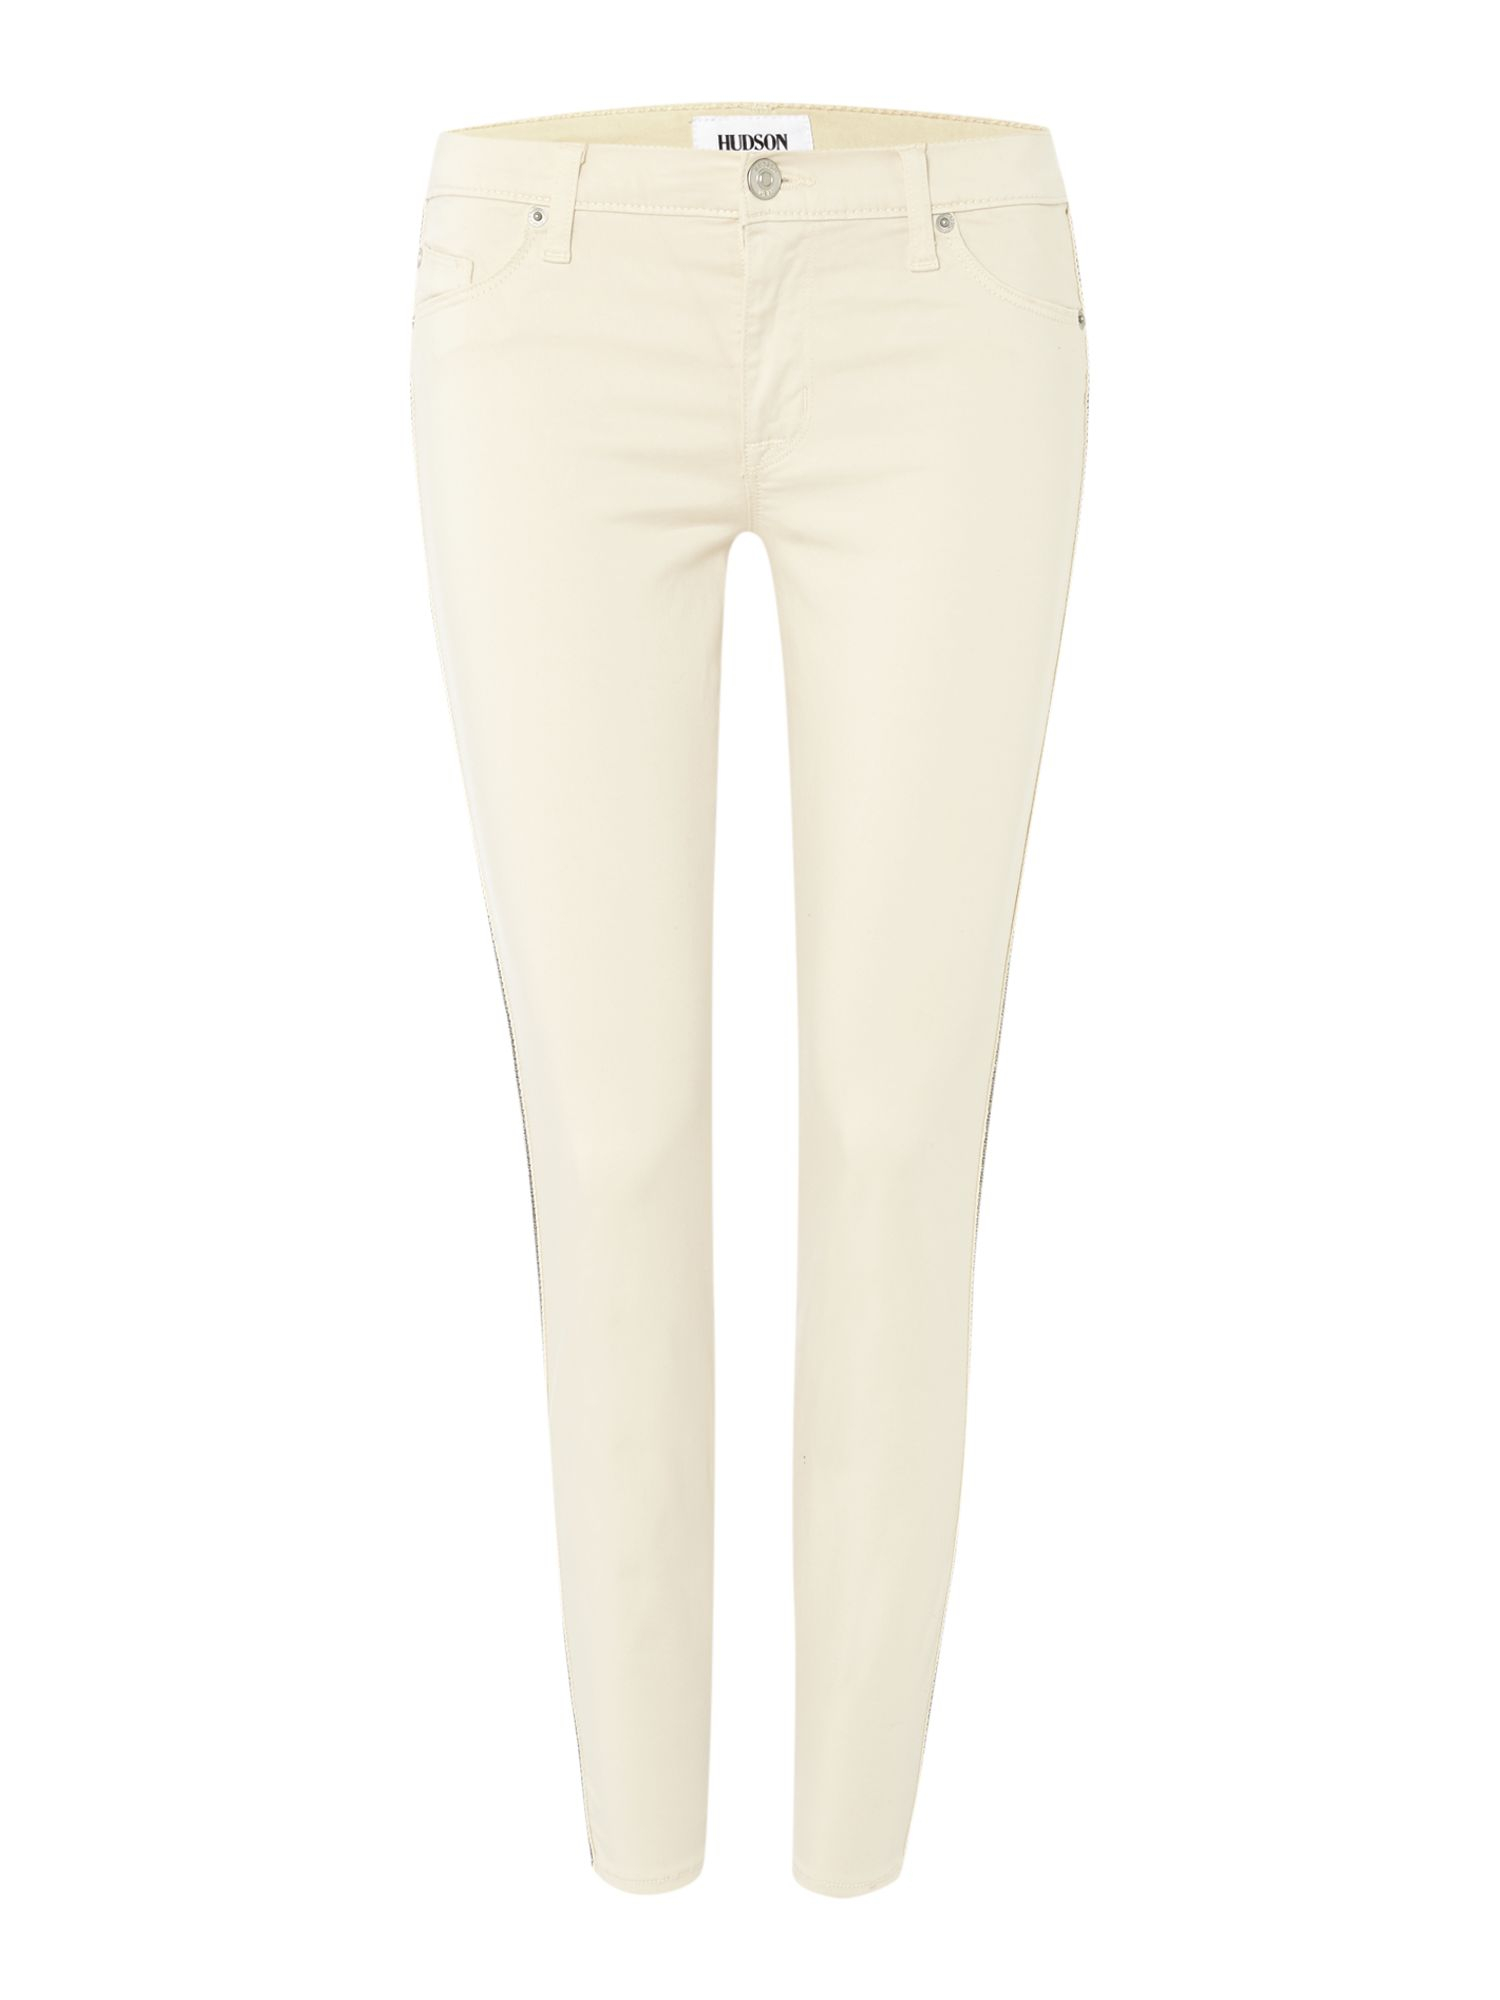 Hudson jeans Luna Super Skinny Cropped Jeans In Bone White in ...